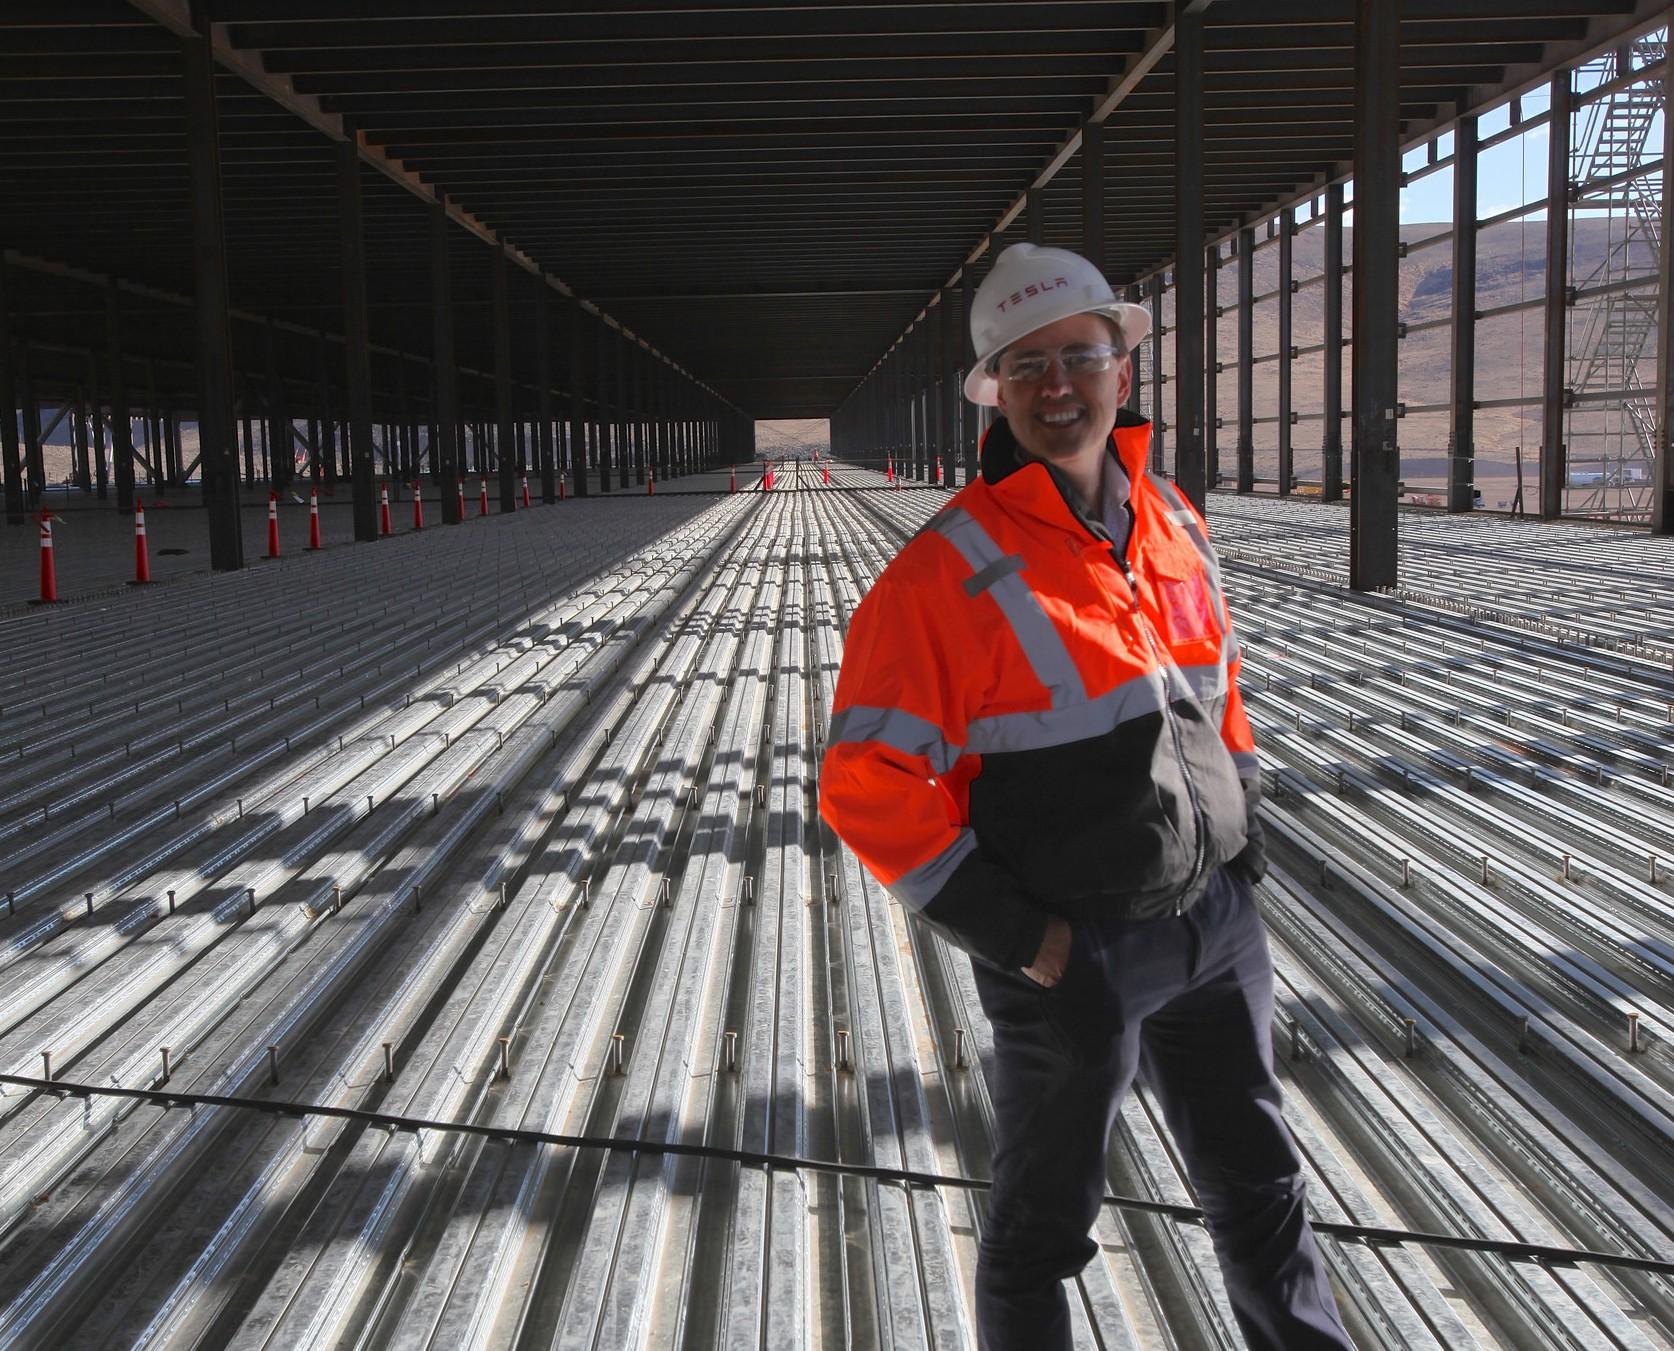 Investor Steve Jurvetson standing inside the under construction Tesla battery factory, outside of Reno, Nevada.